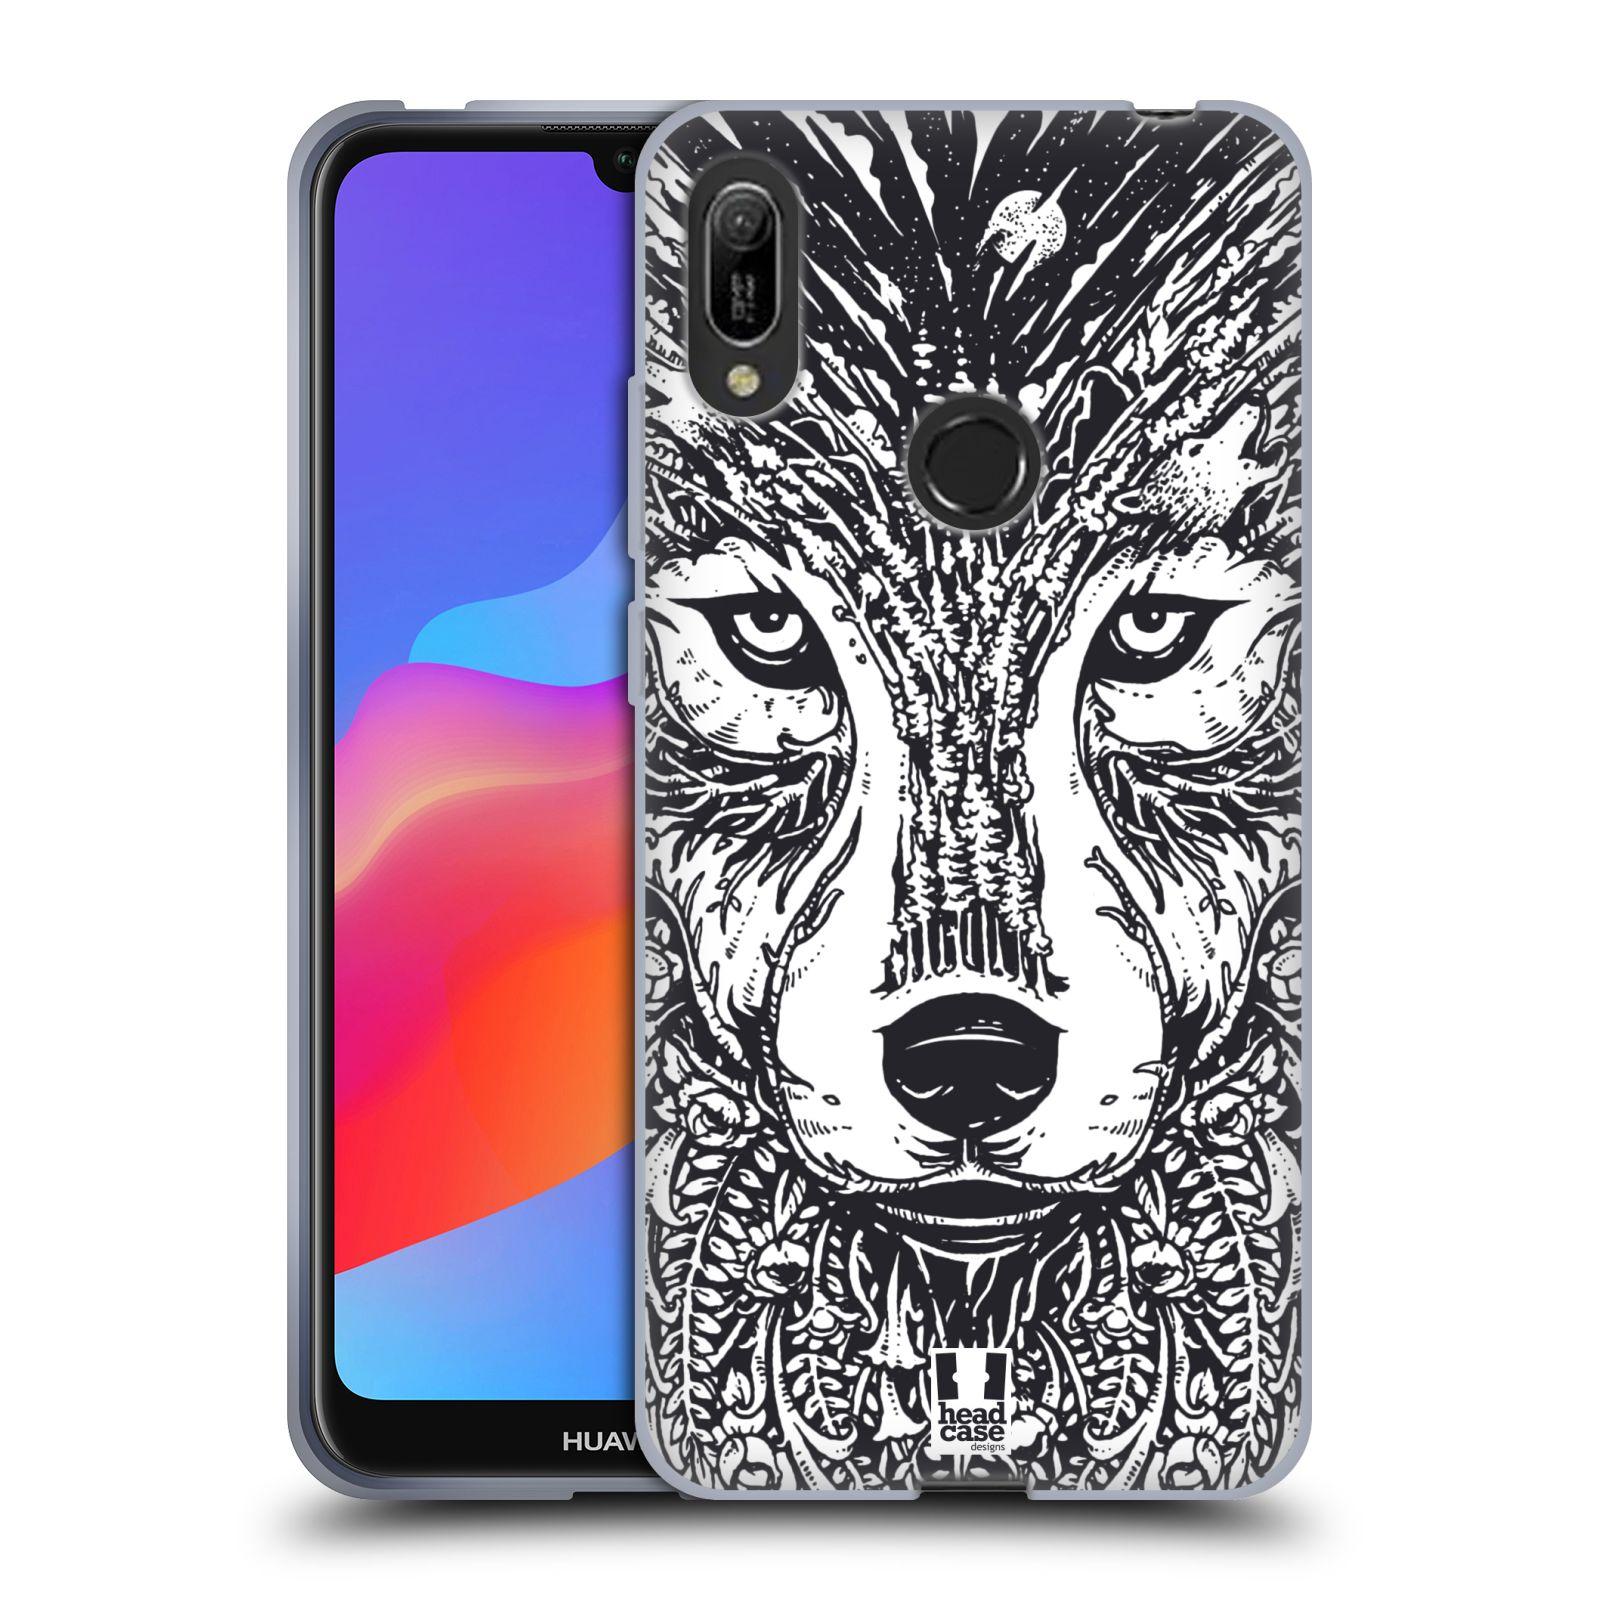 Silikonové pouzdro na mobil Huawei Y6 (2019) - Head Case - DOODLE TVÁŘ VLK